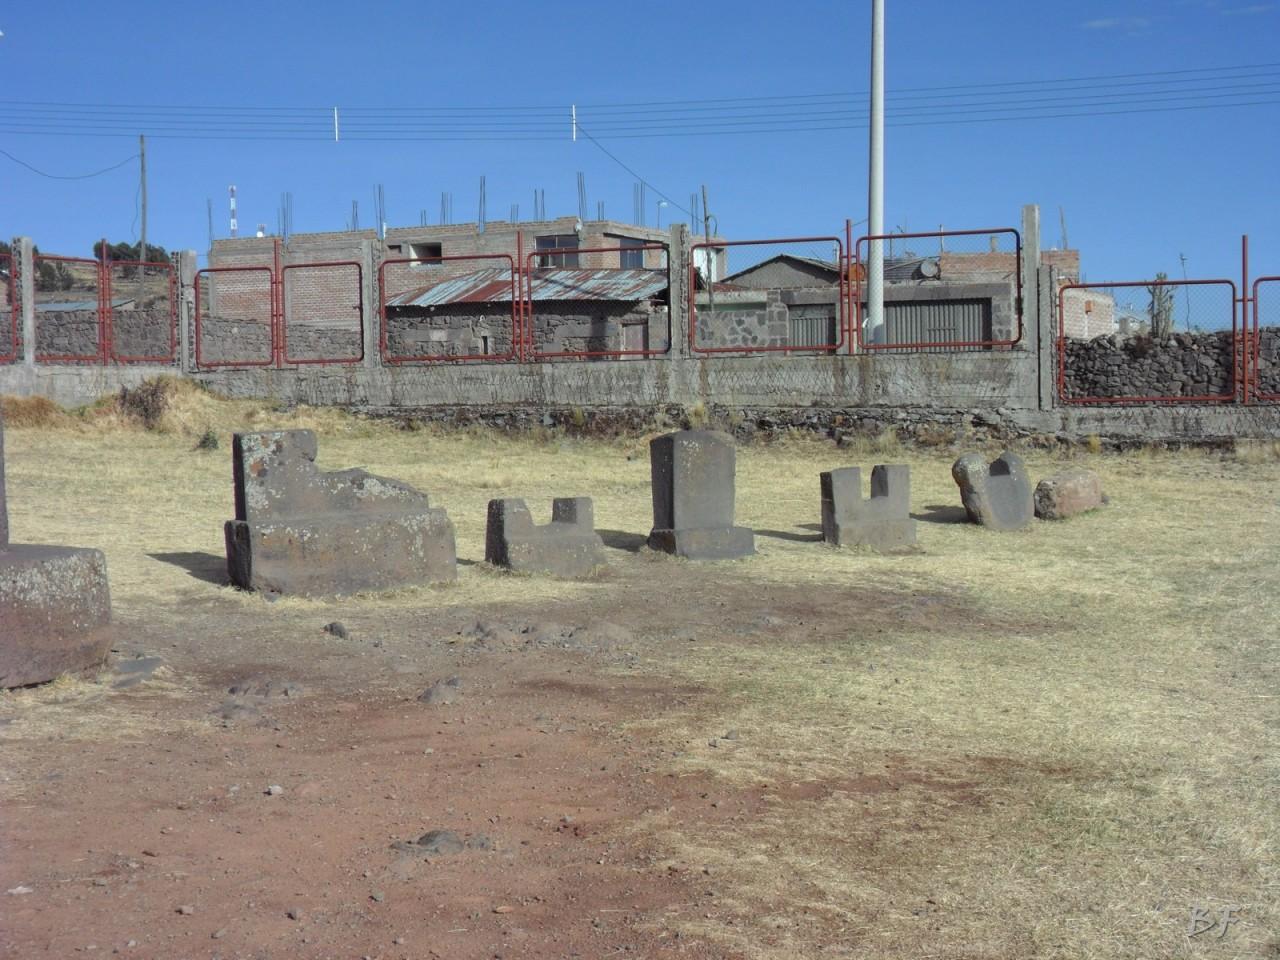 Mura-Poligonali-Megaliti-Inca-Uyo-Puno-Perù-8